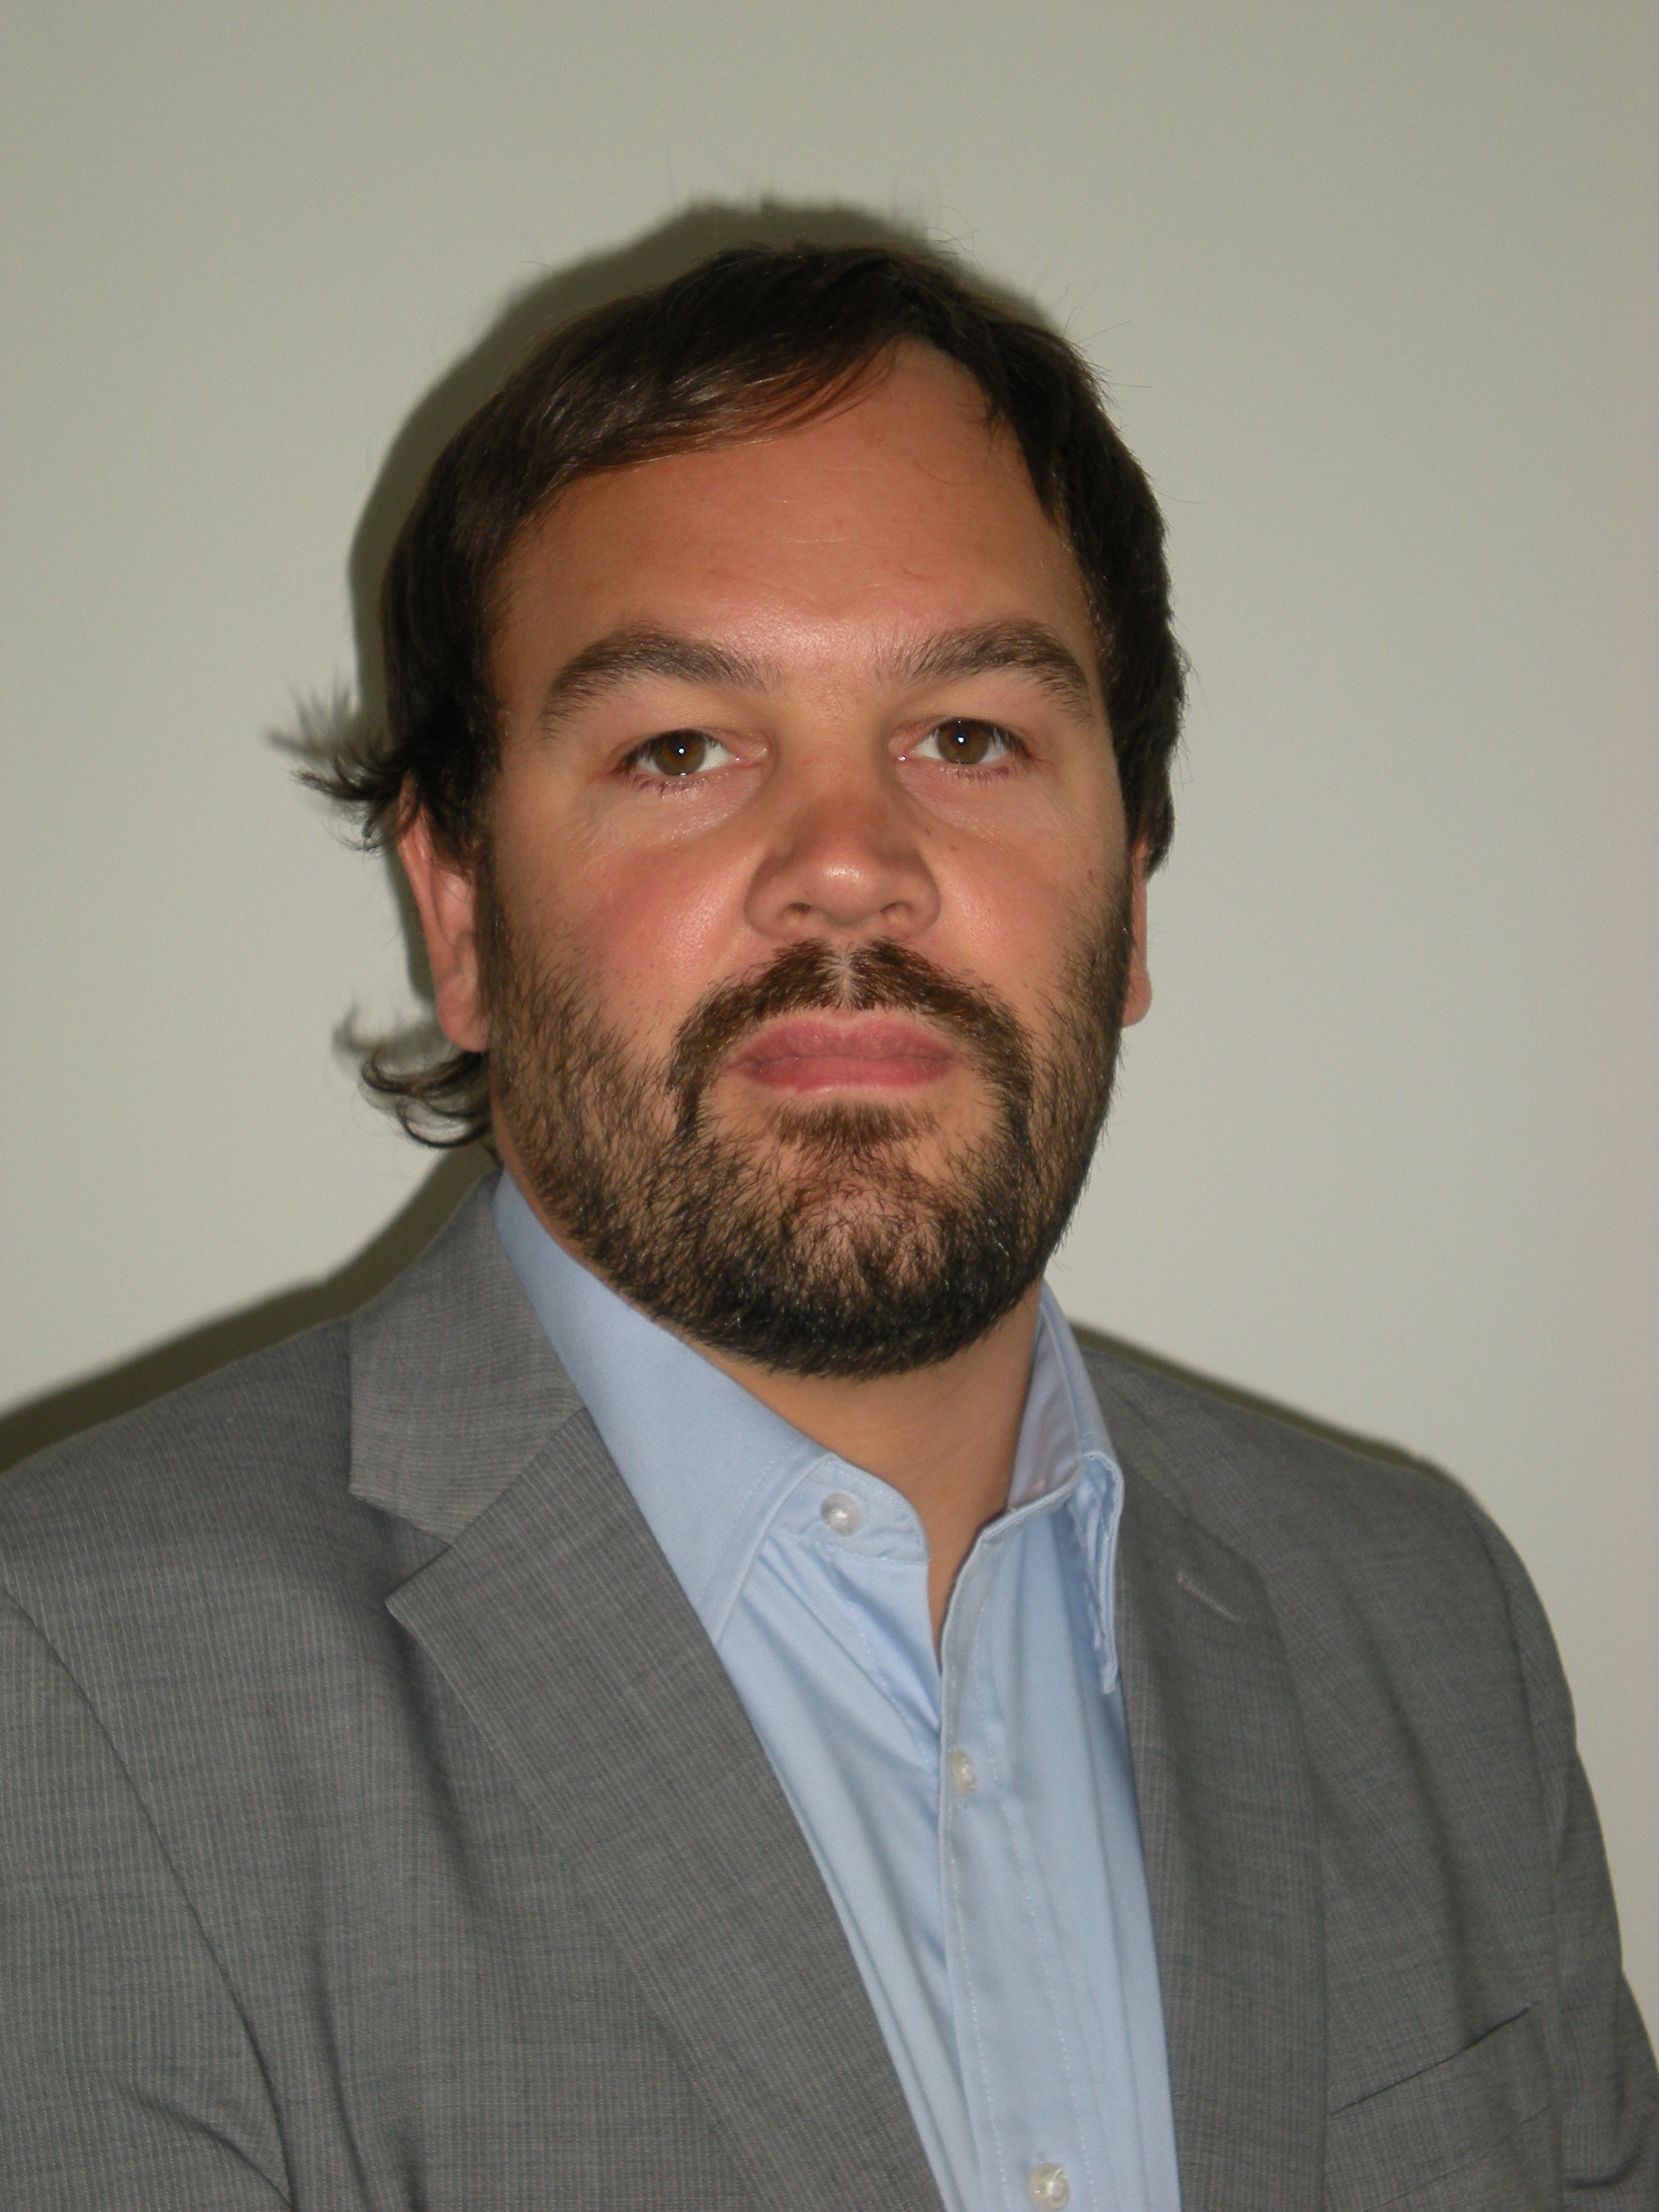 Jon Petersson